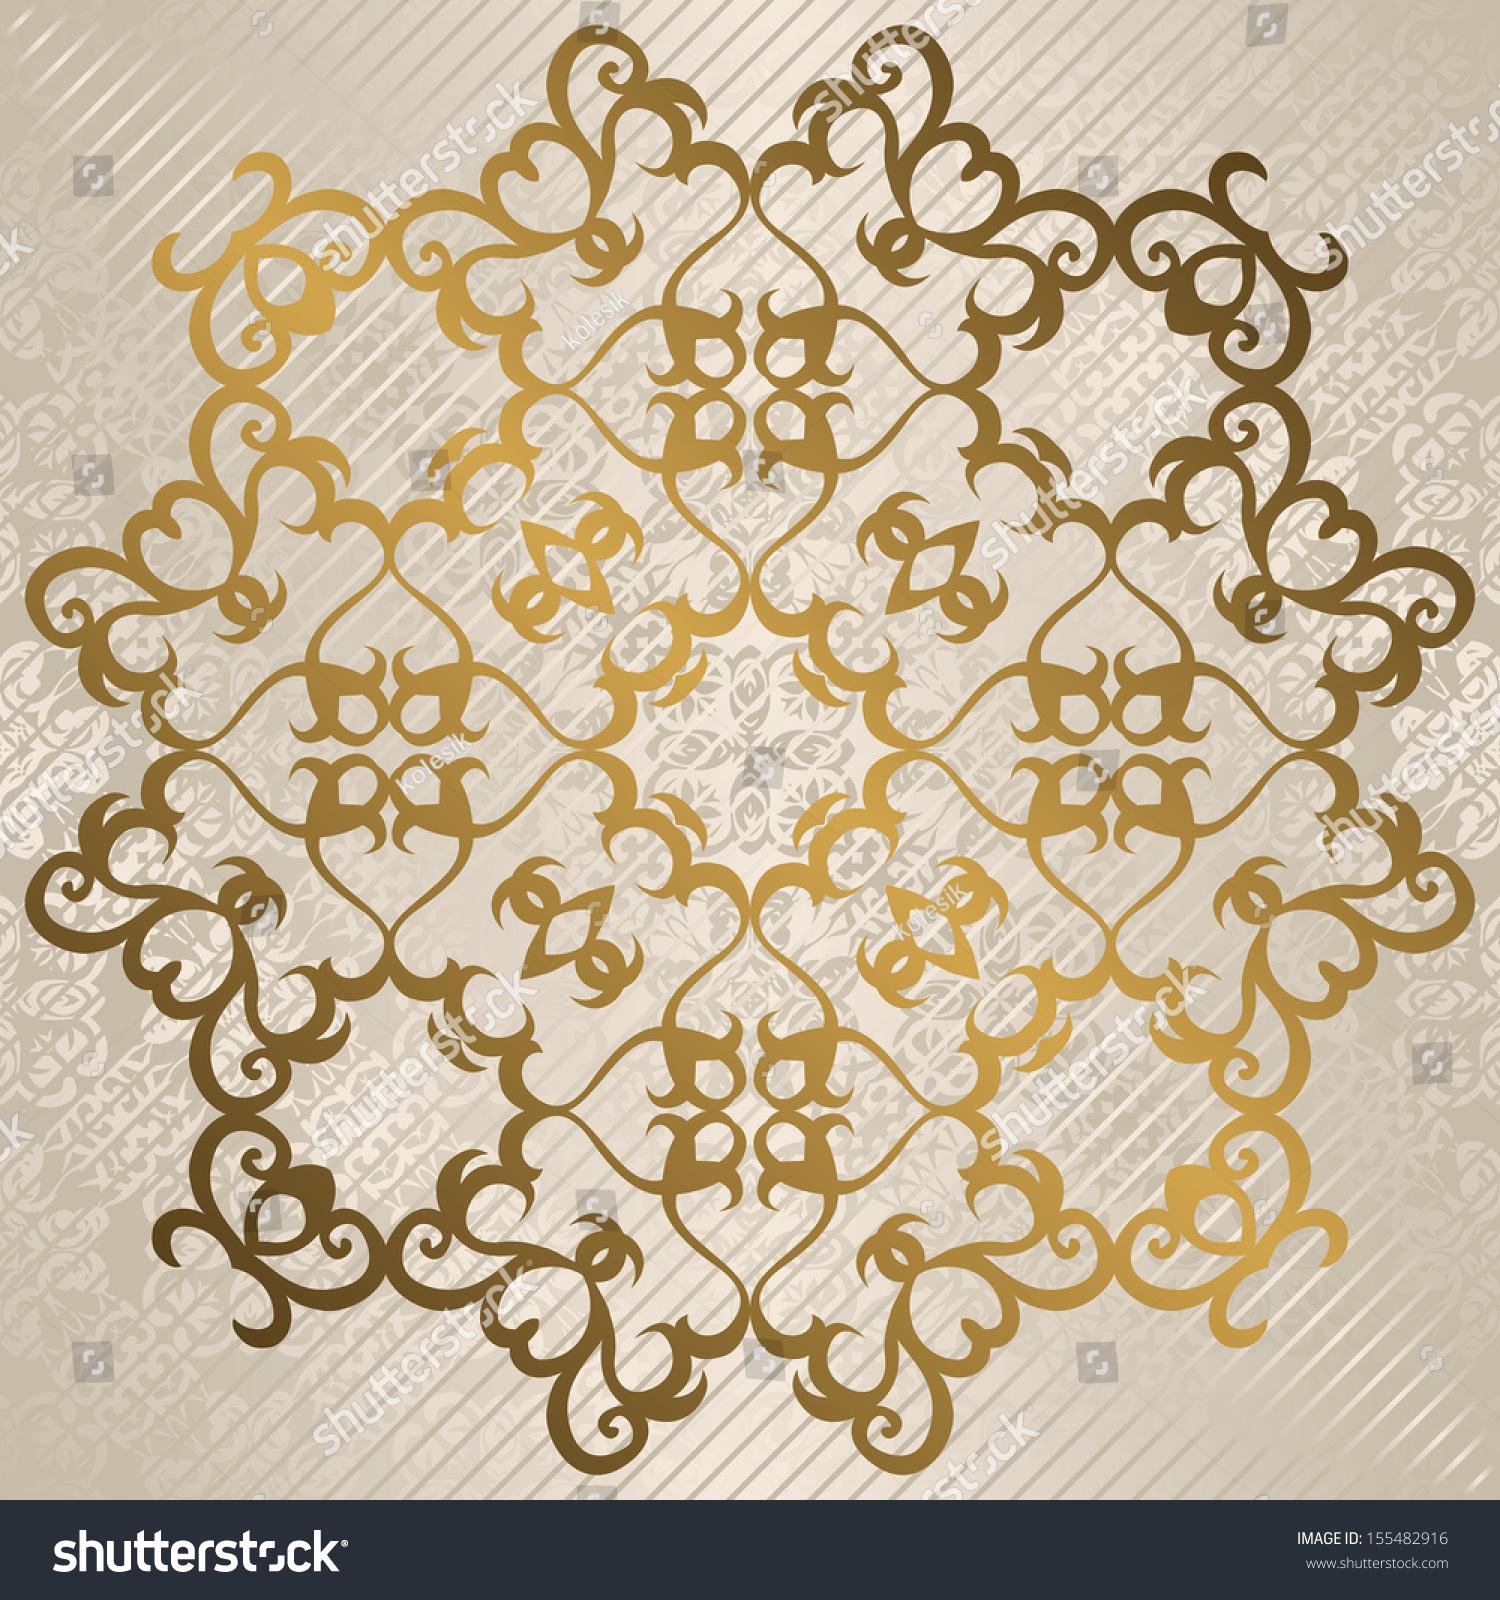 elegant round vintage pattern in gold light background